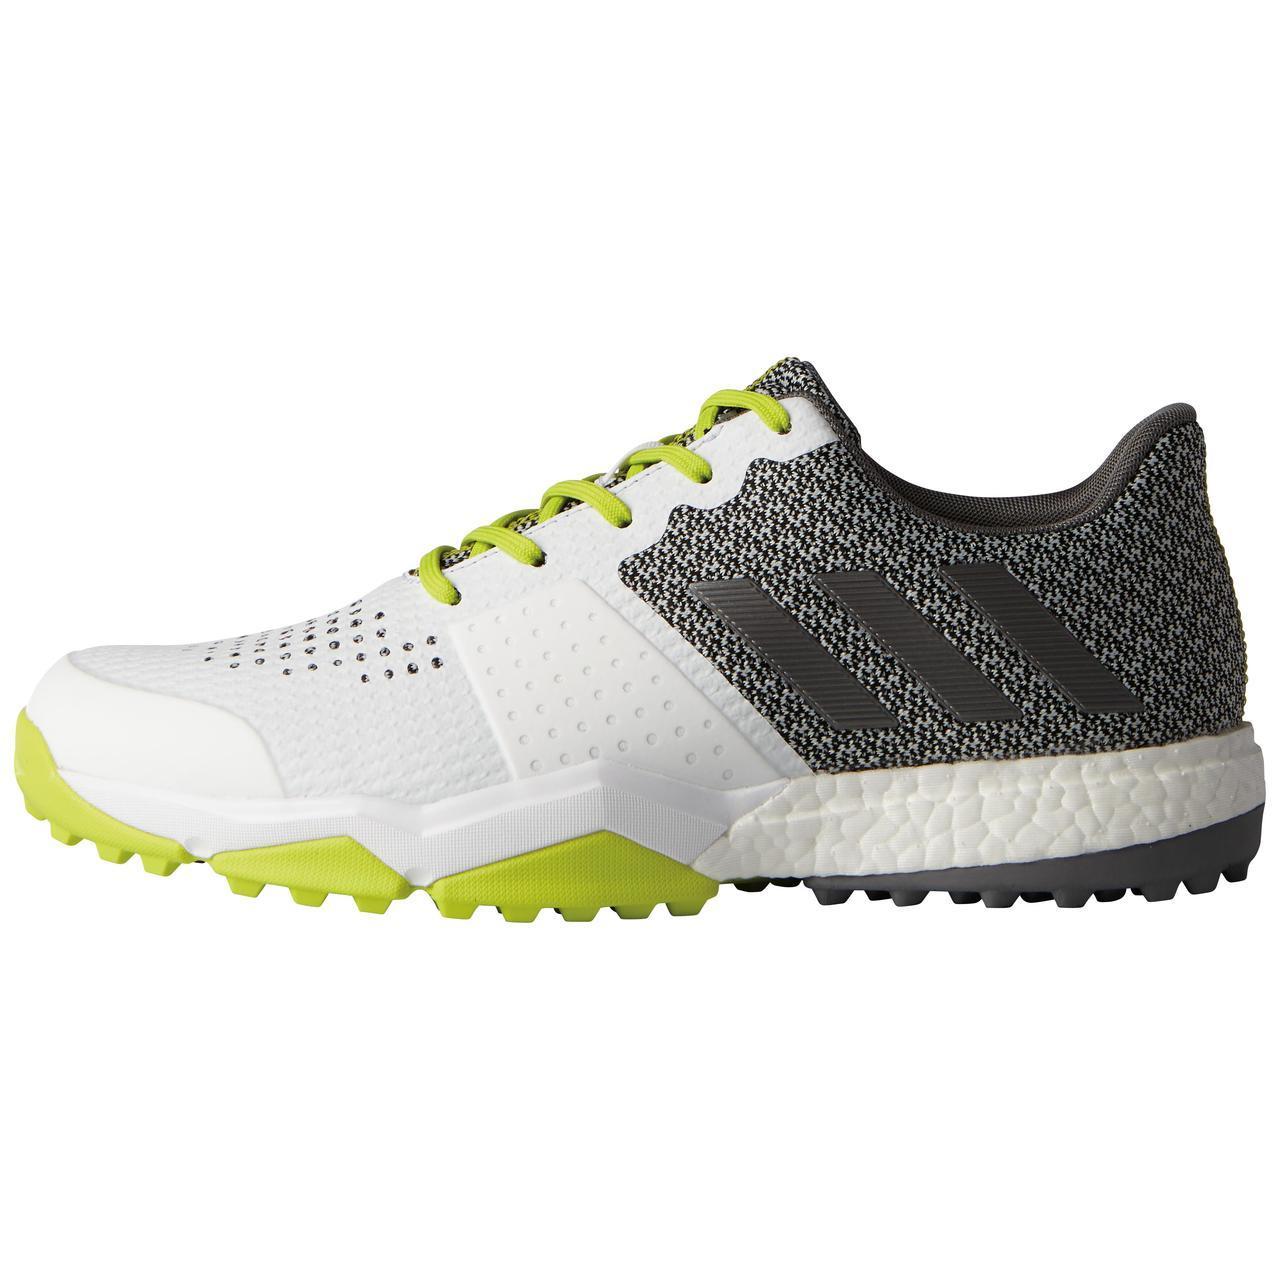 wholesale dealer b4f37 da0b0 Details about Adidas Adipower Sport Boost 3 Mens Golf Shoes -  WhiteSilverYellow - Pick Size